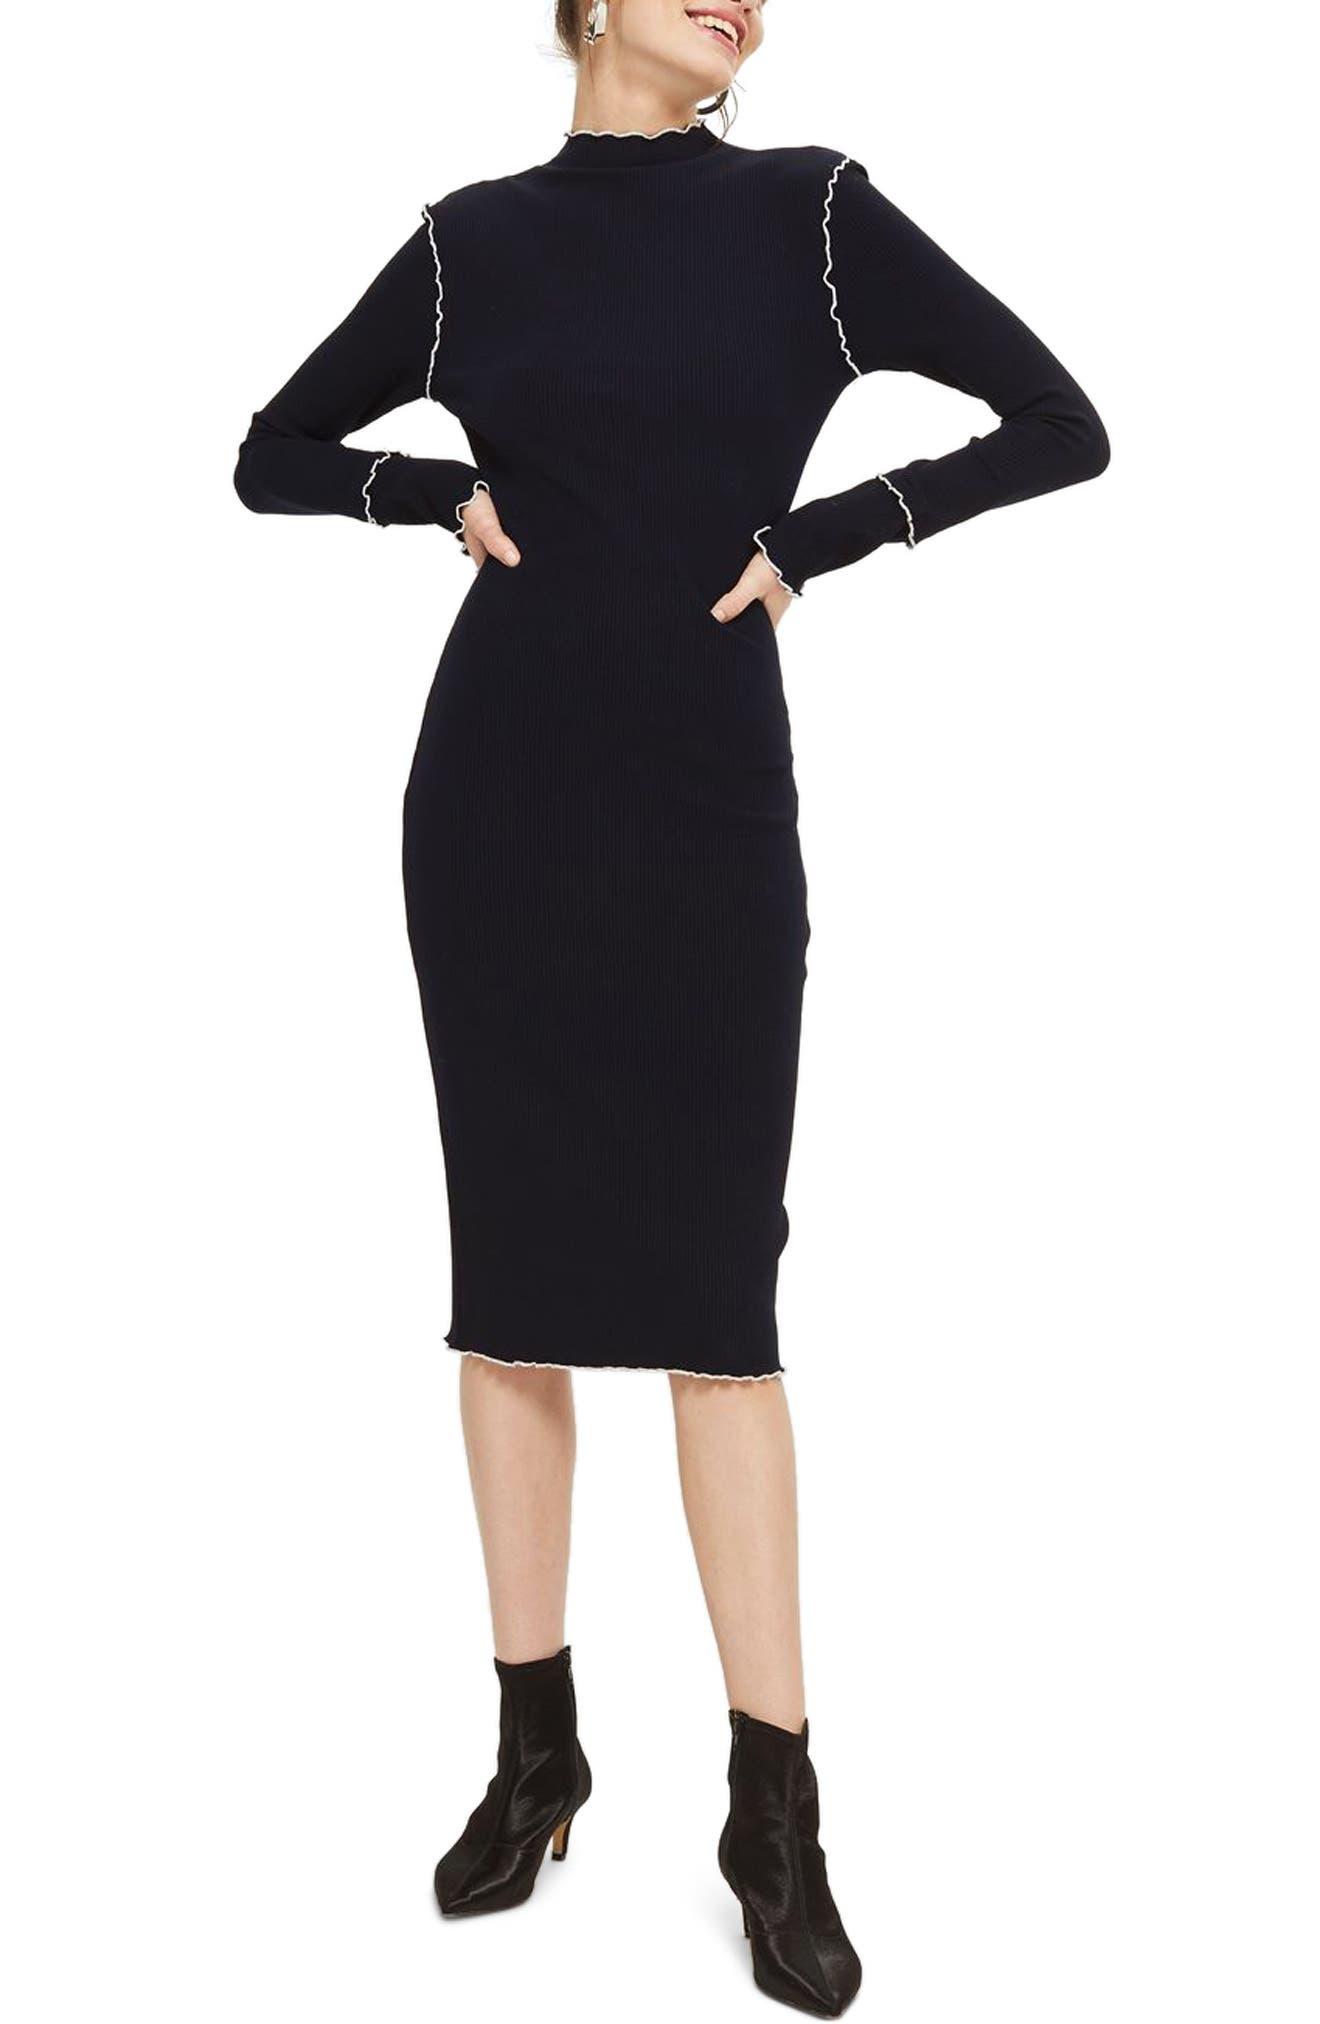 Alternate Image 1 Selected - Topshop Lettuce Trim Body-Con Midi Dress